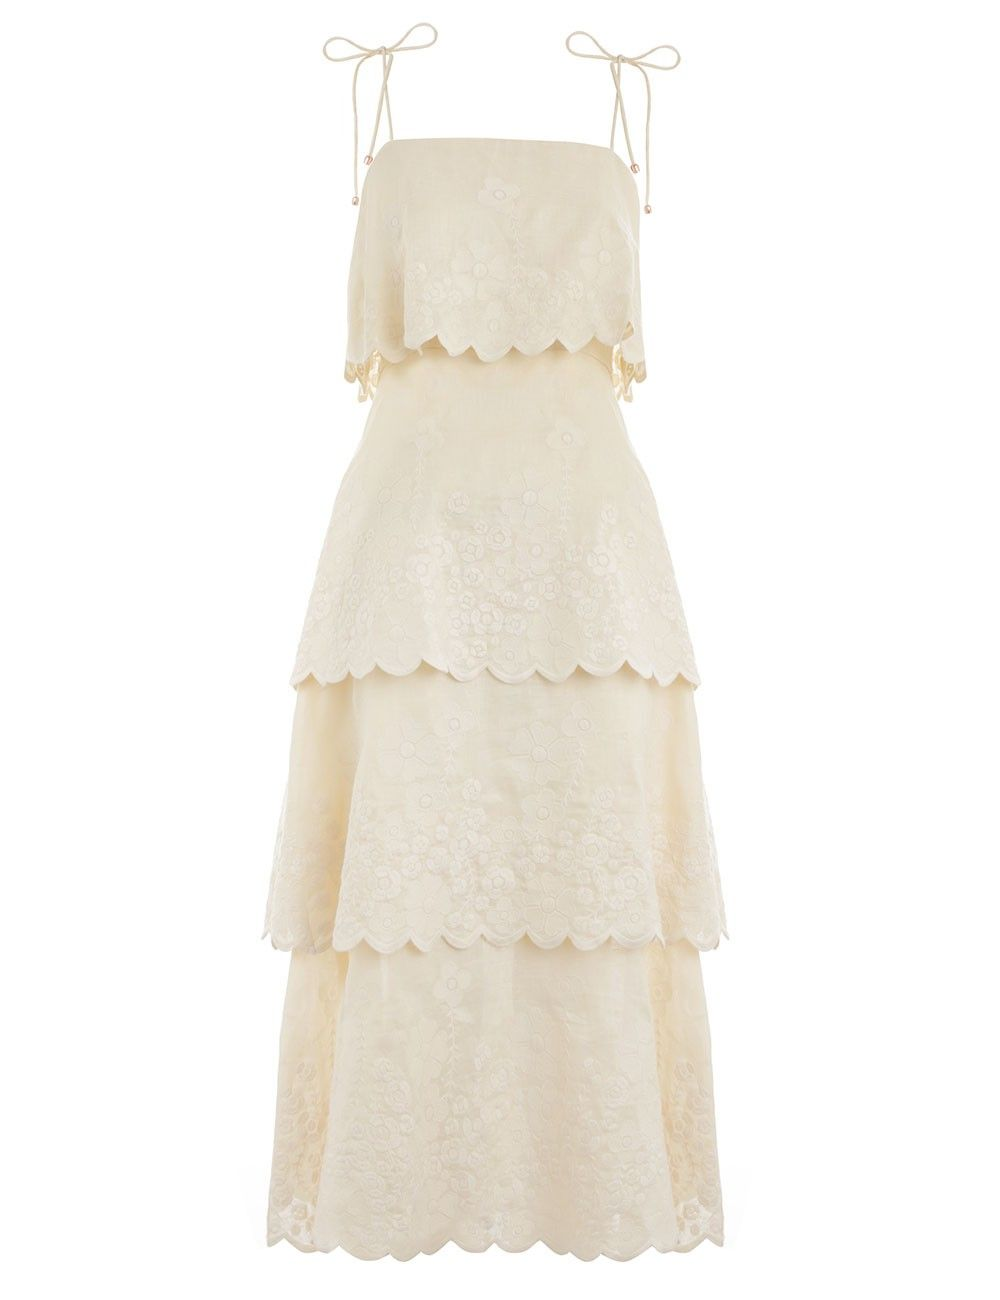 Primrose Embroidered Dress  เดรส, สไตล์เสื้อผ้า, ชุดเดรส